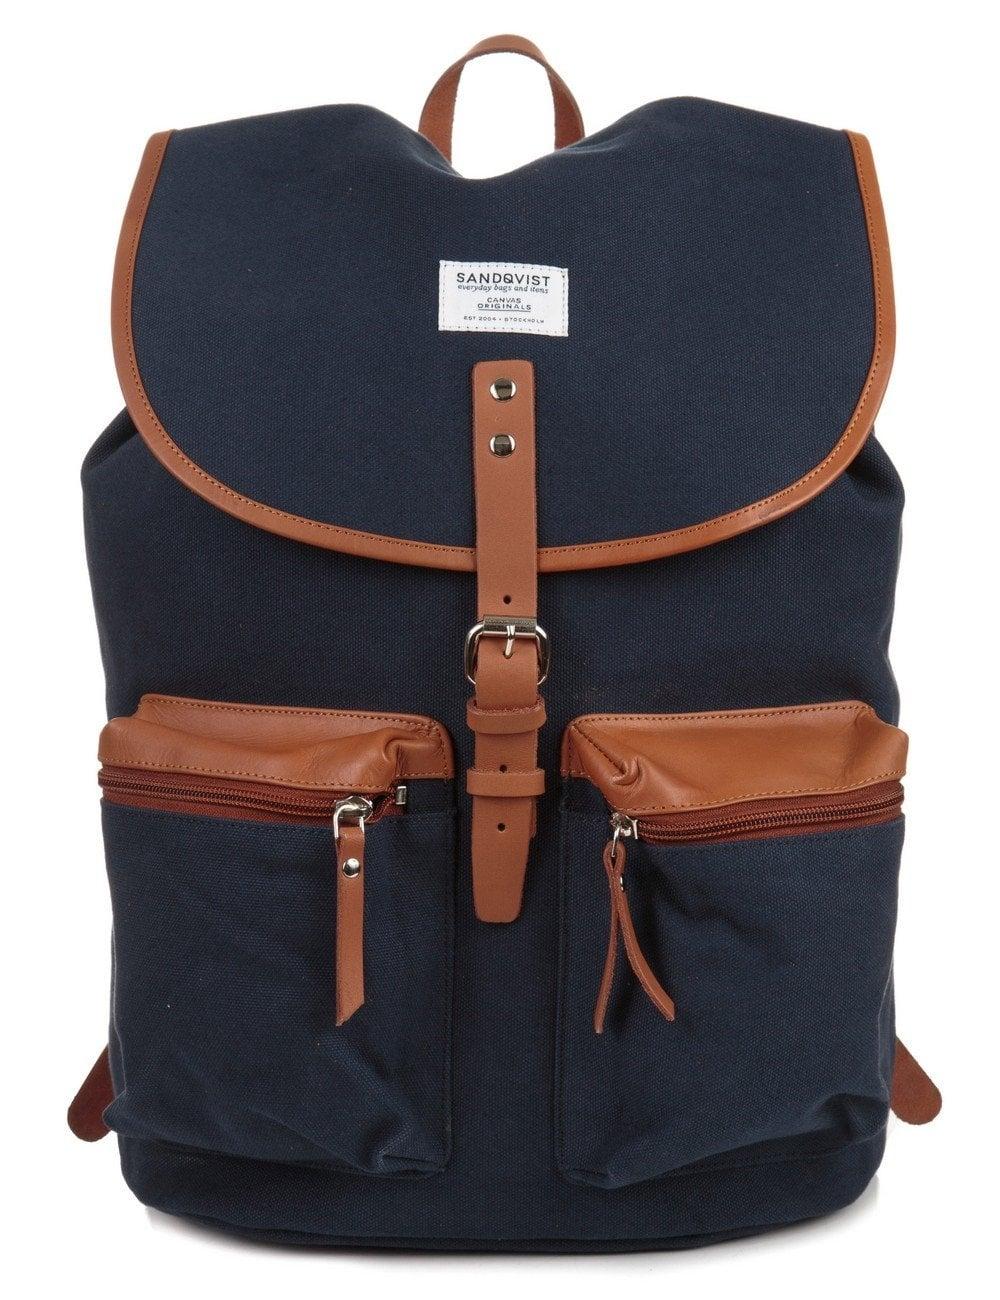 Home accessories bag shop sandqvist sandqvist roald